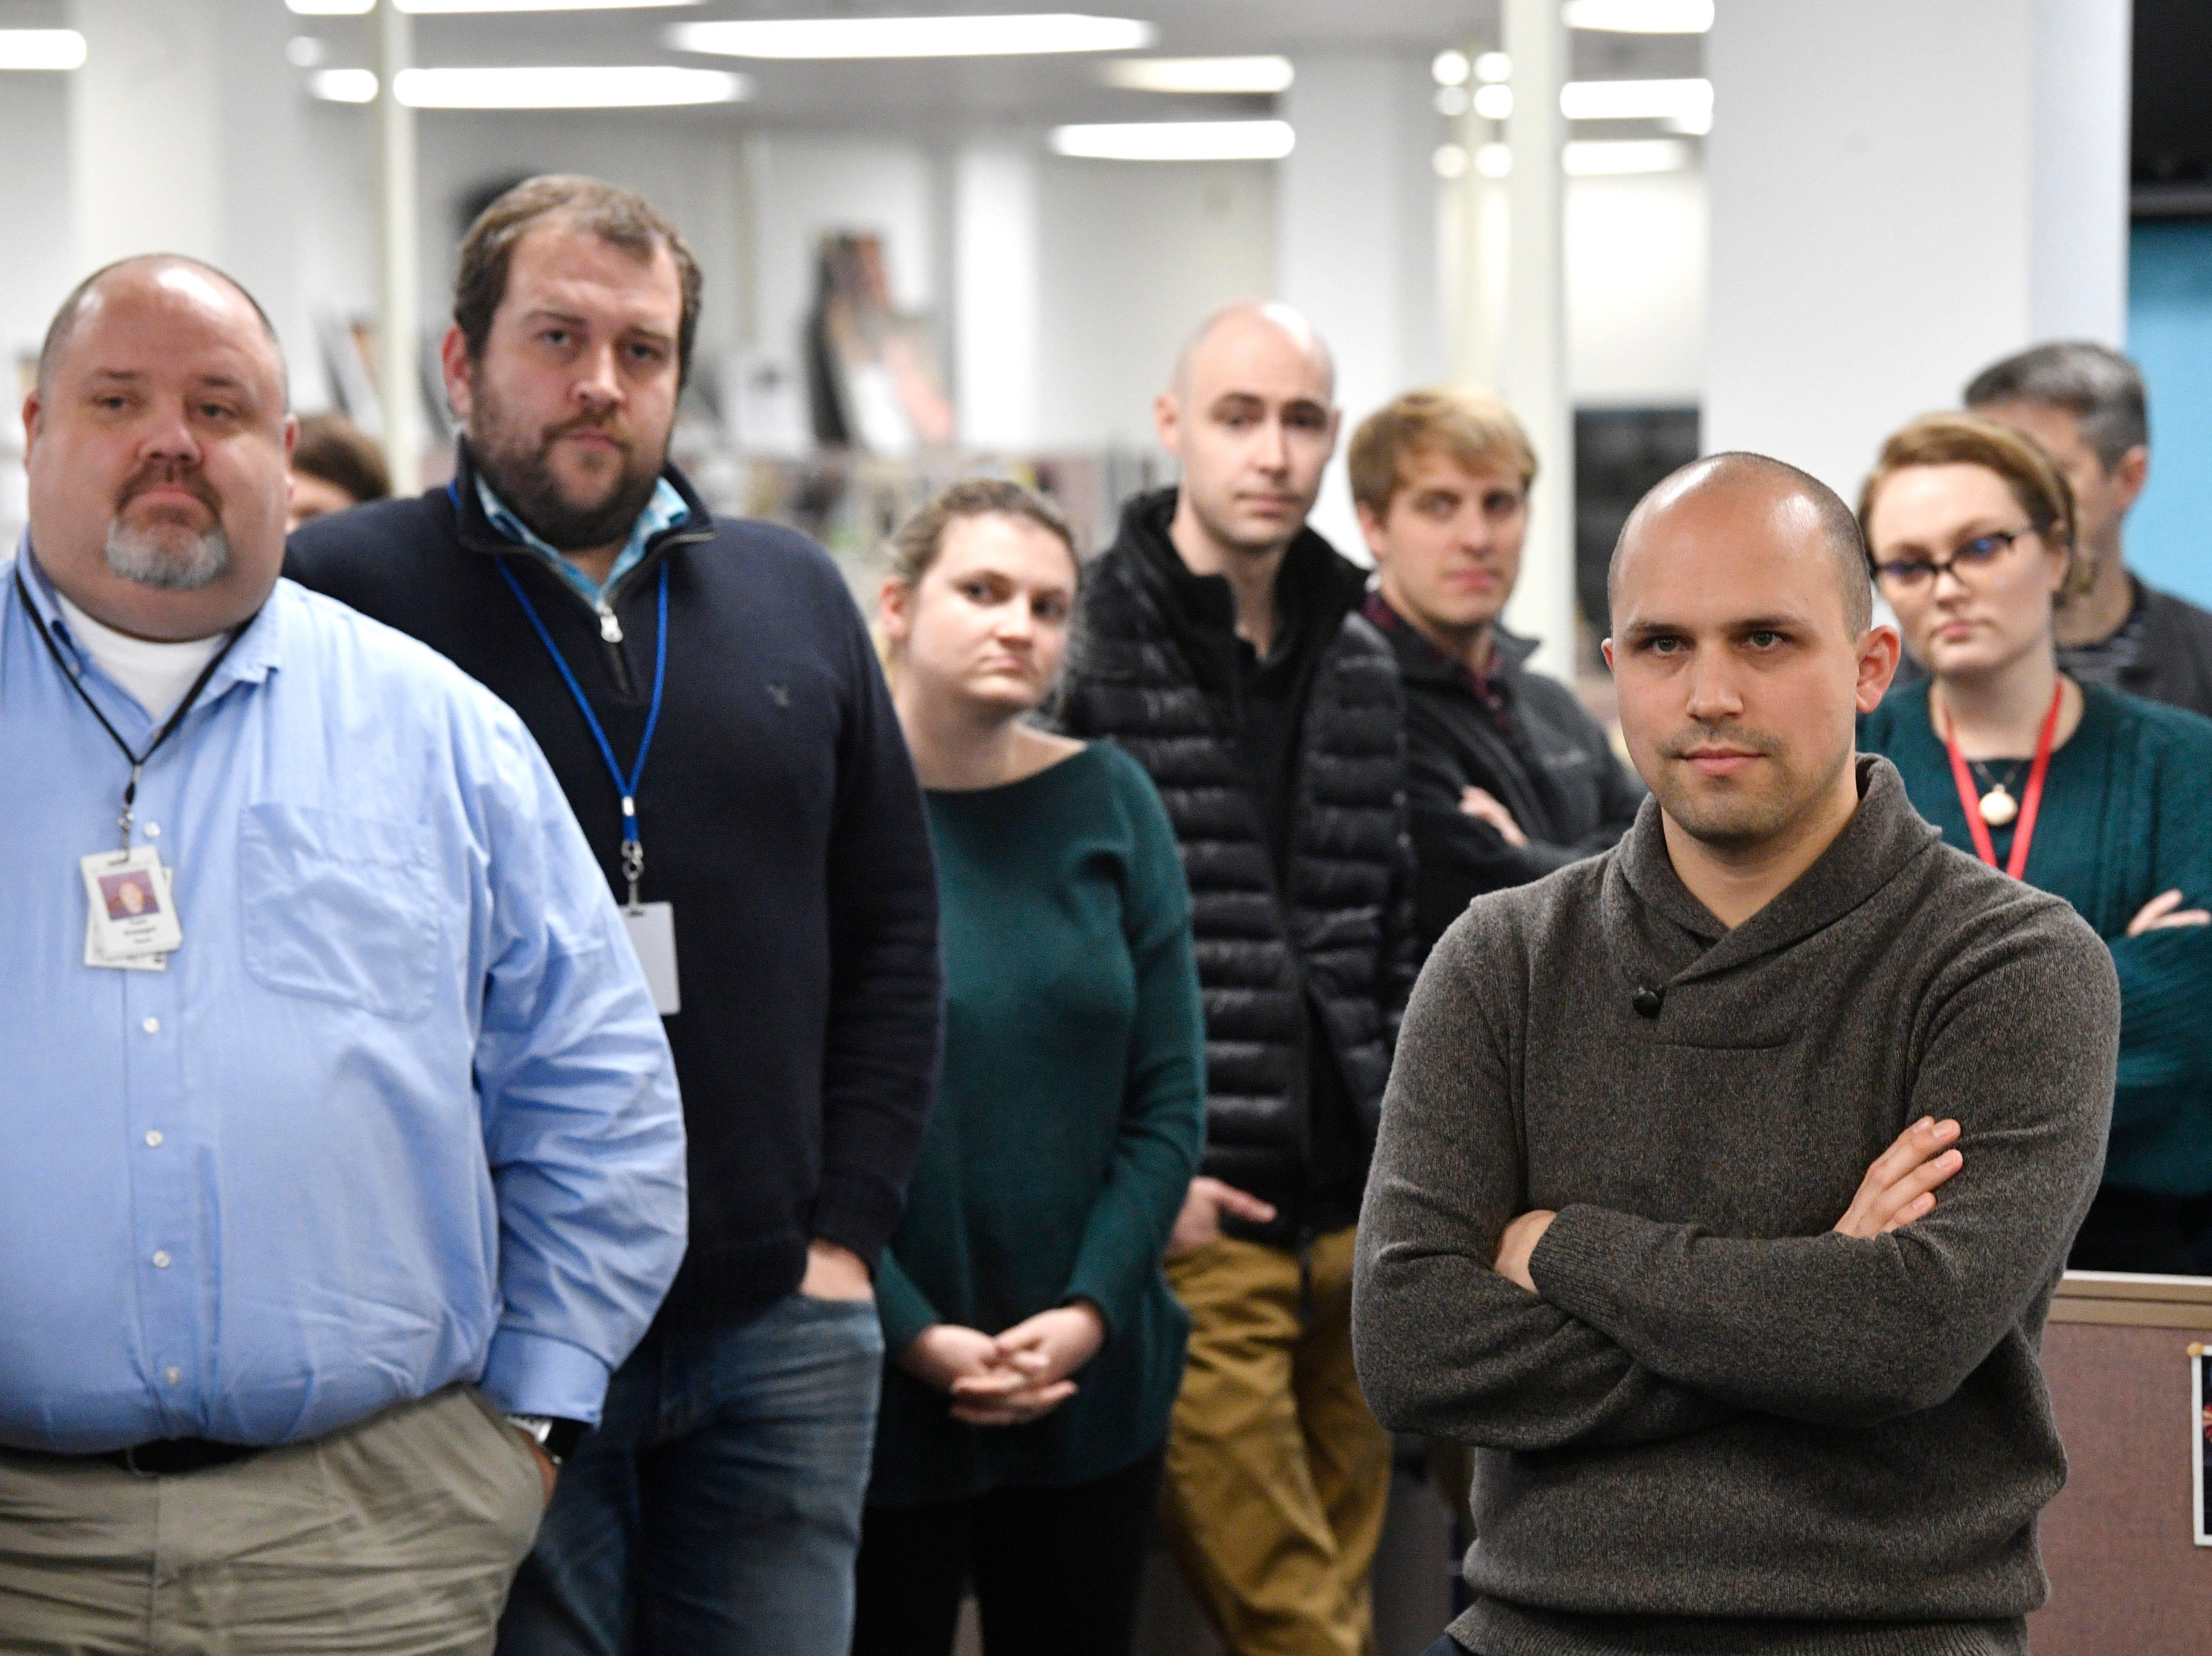 Staff members listen as Editor Michael Anastasi speaks in The Tennessean newsroom Wednesday, Jan. 2, 2019, in Nashville.